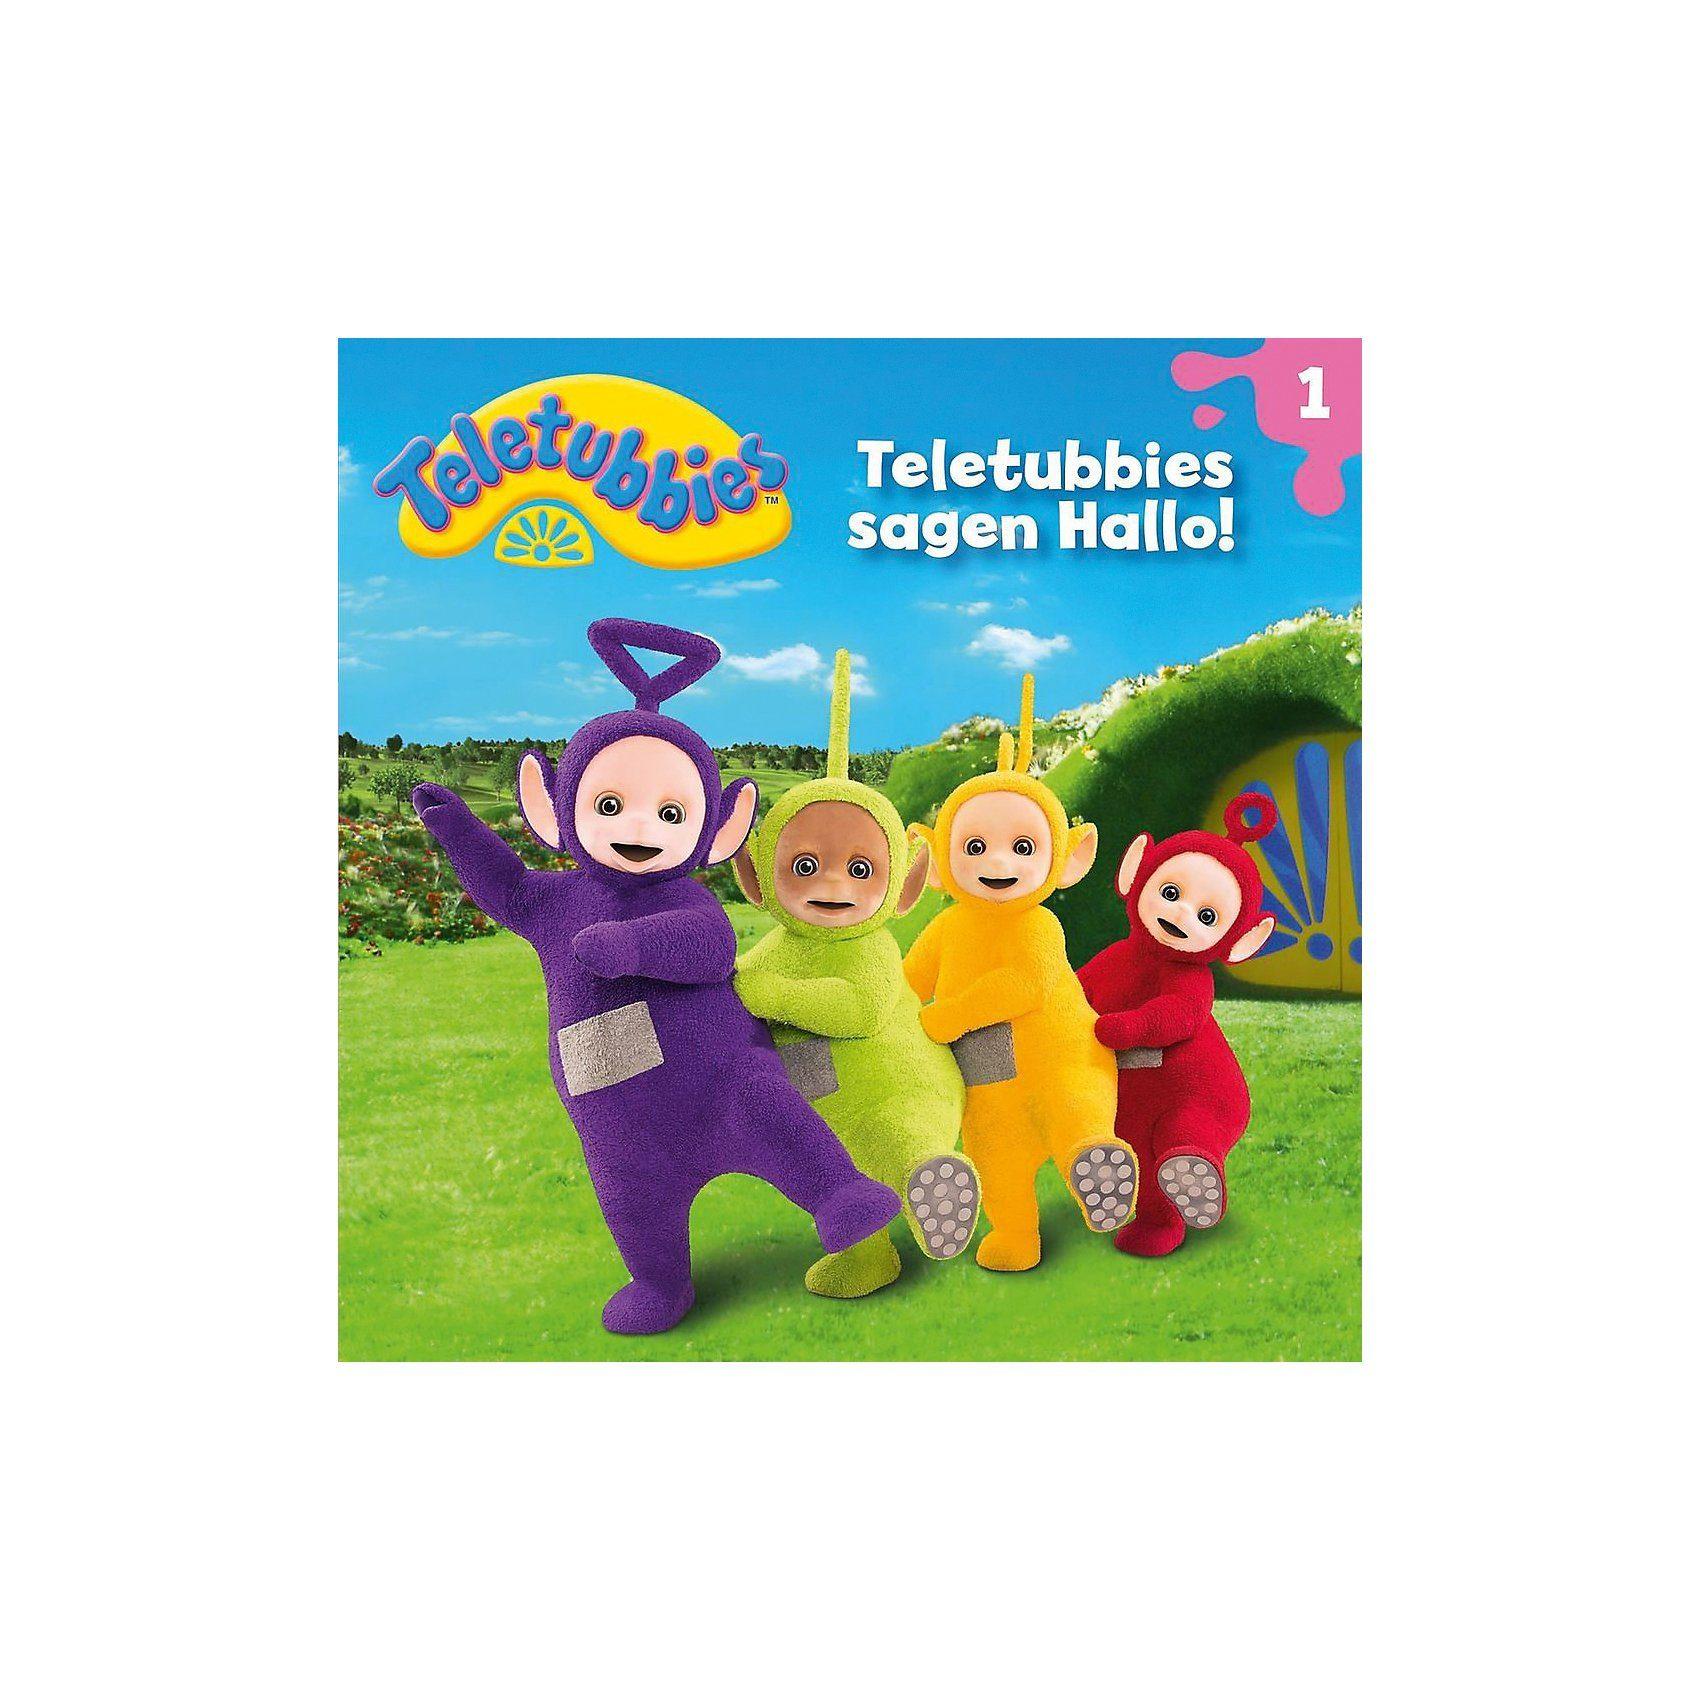 Universal CD Teletubbies 01 - Teletubbies Sagen Hallo!